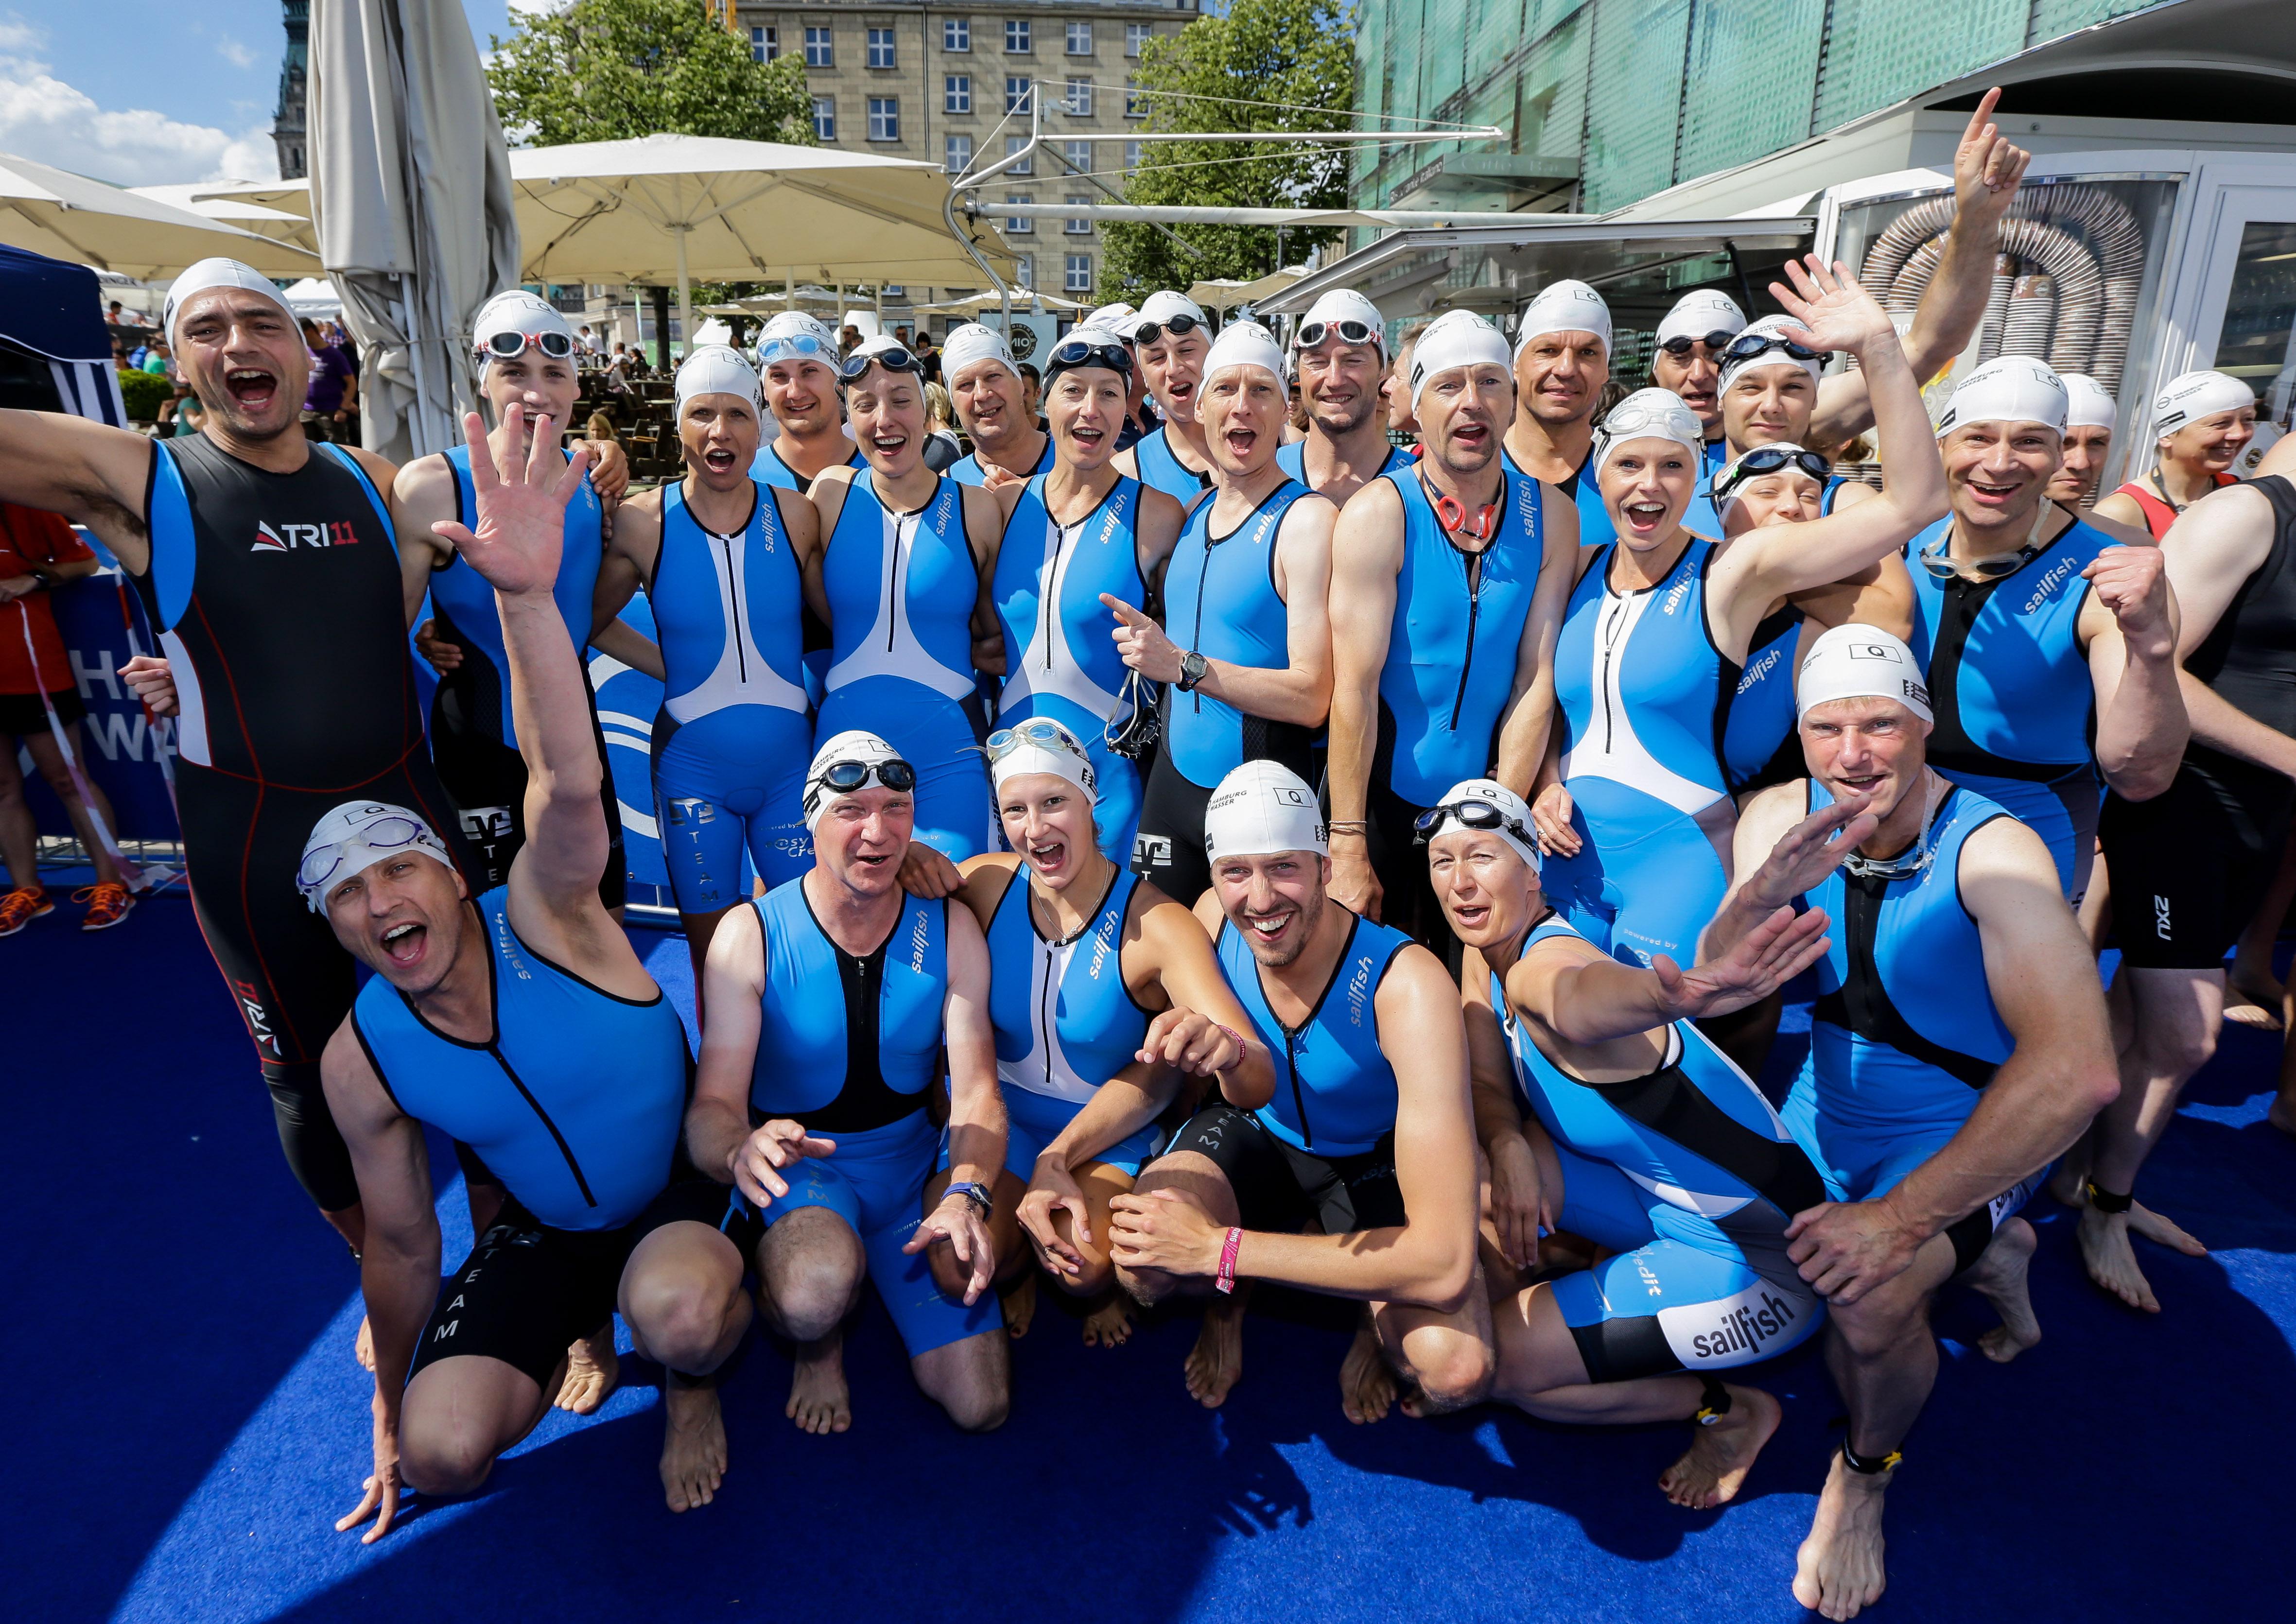 Triathlon in Hamburg / 2013 williamhill coupon code 2015 williamhill tunisie / Sportliches in williamhill sh bonus Hamburg / Sport ...